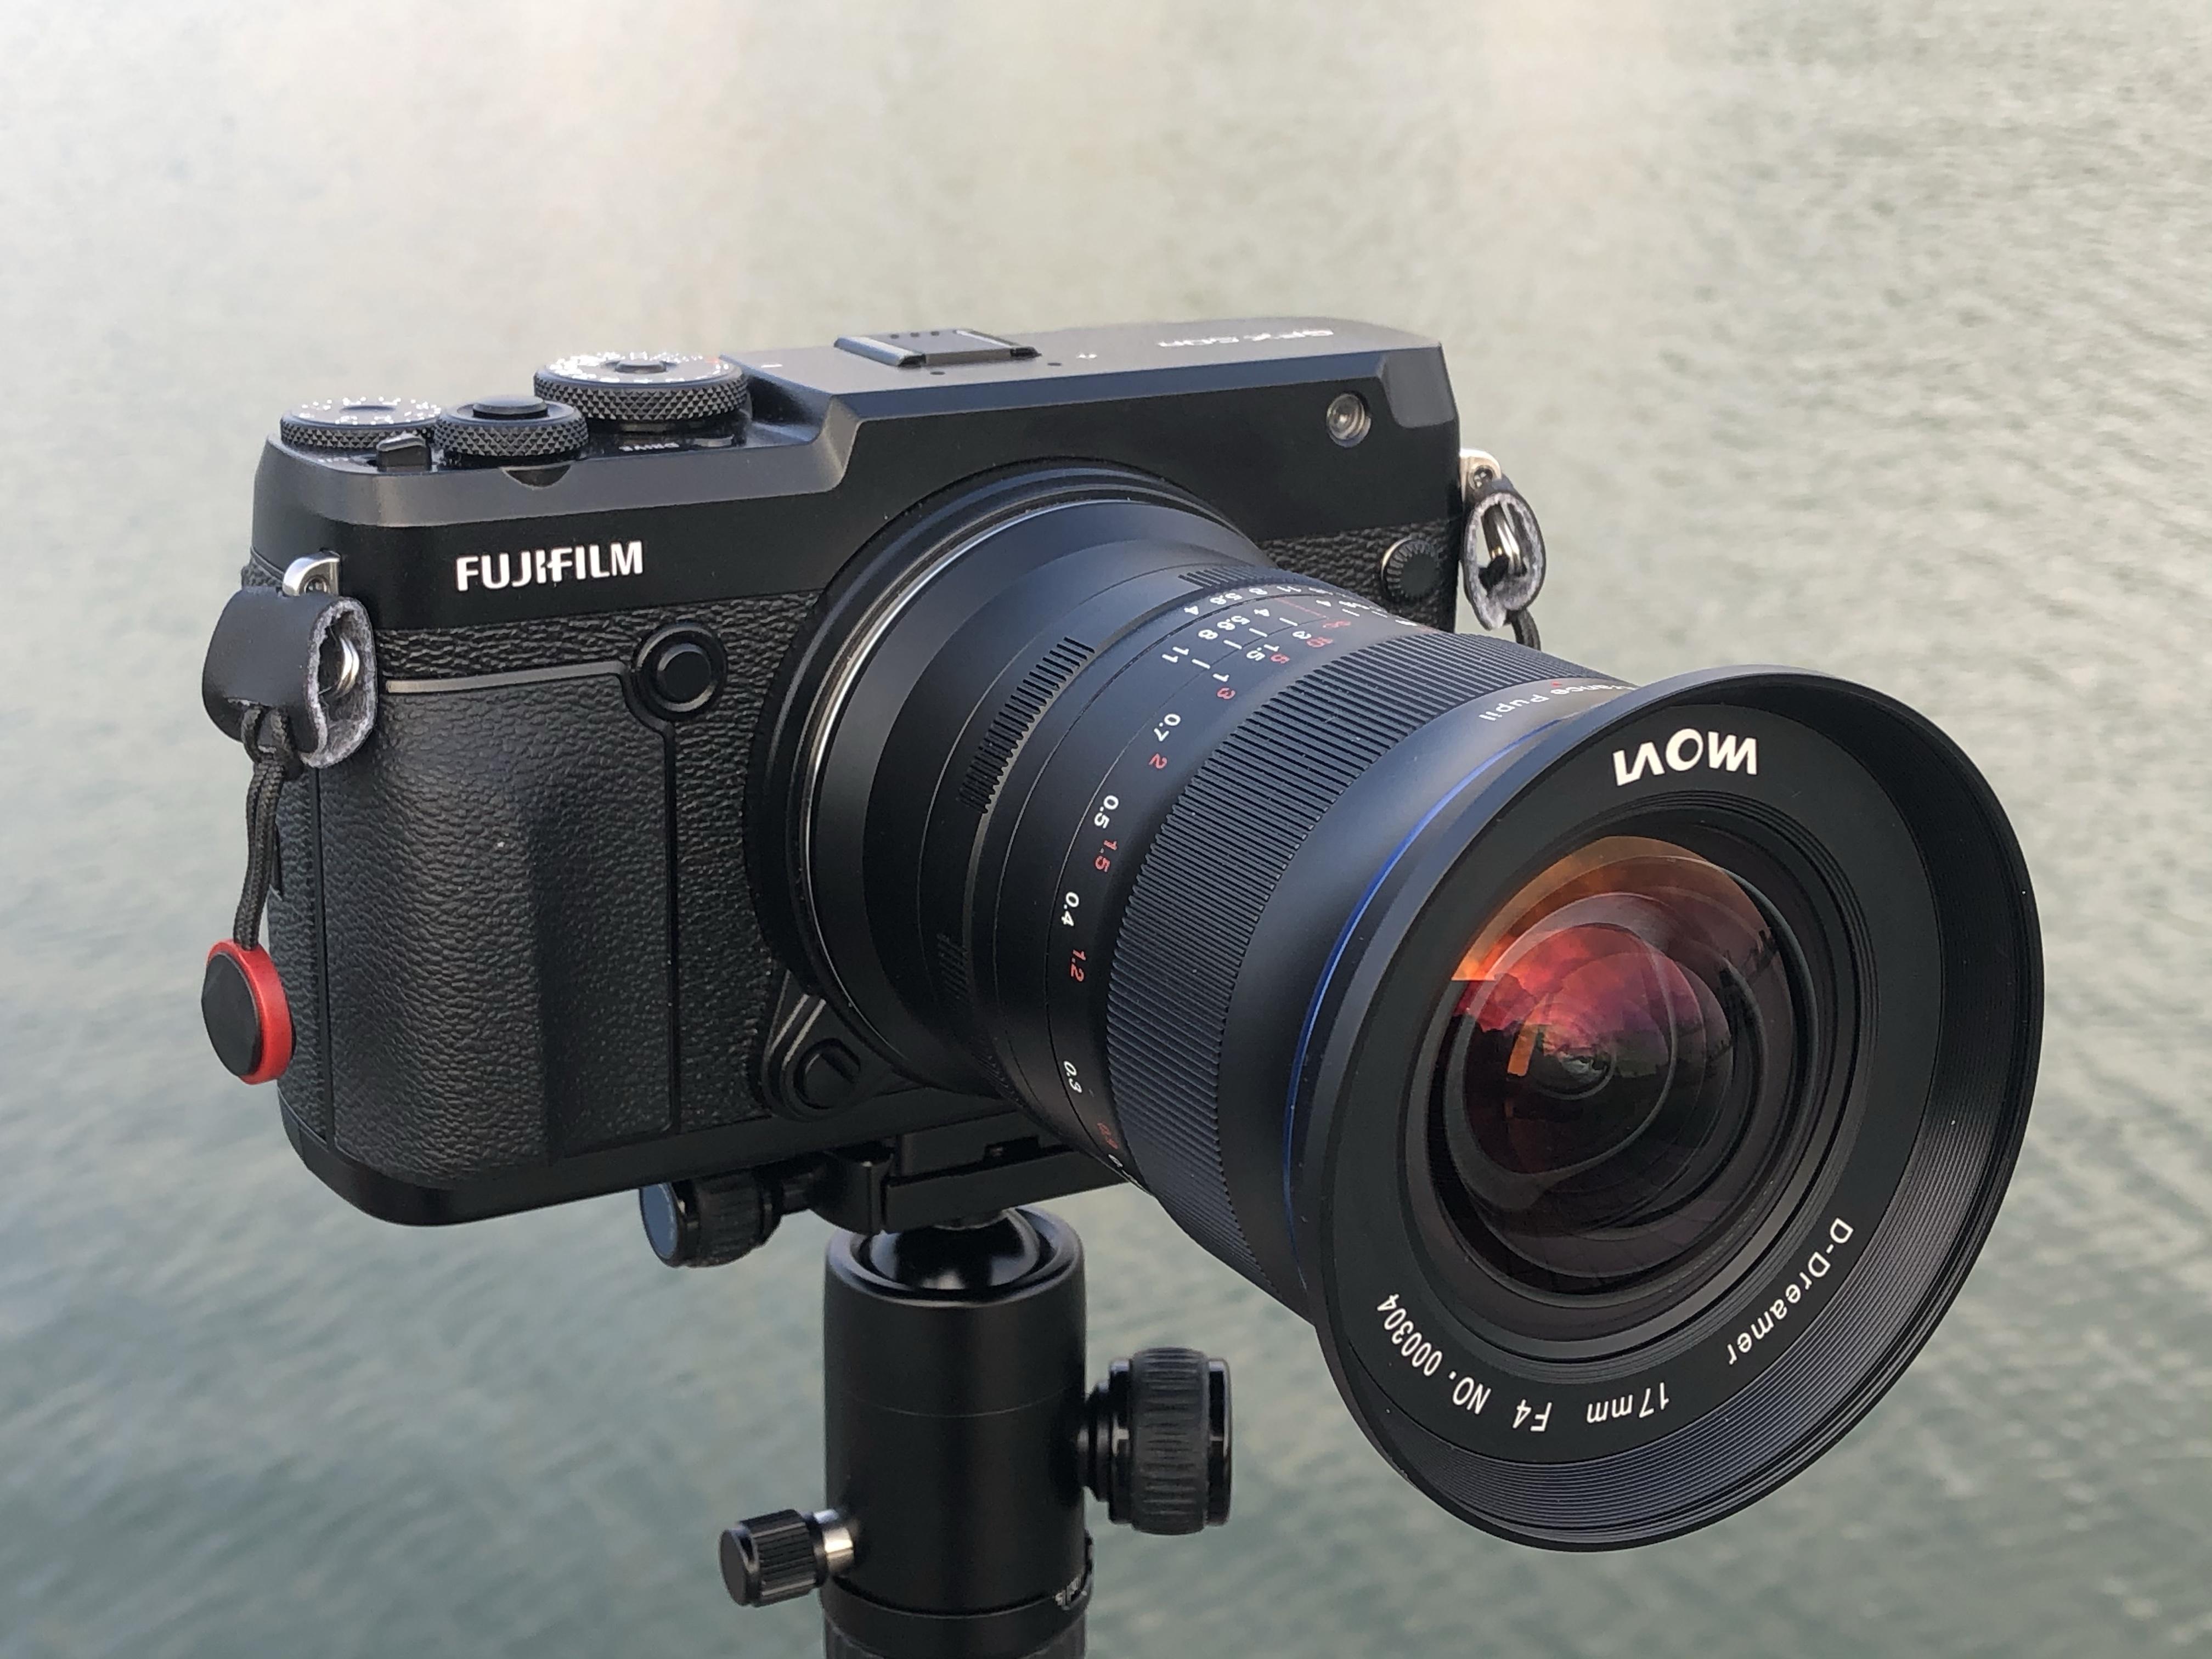 Lens review: Laowa 17mm f/4 GFX Zero-D - Measuring Light